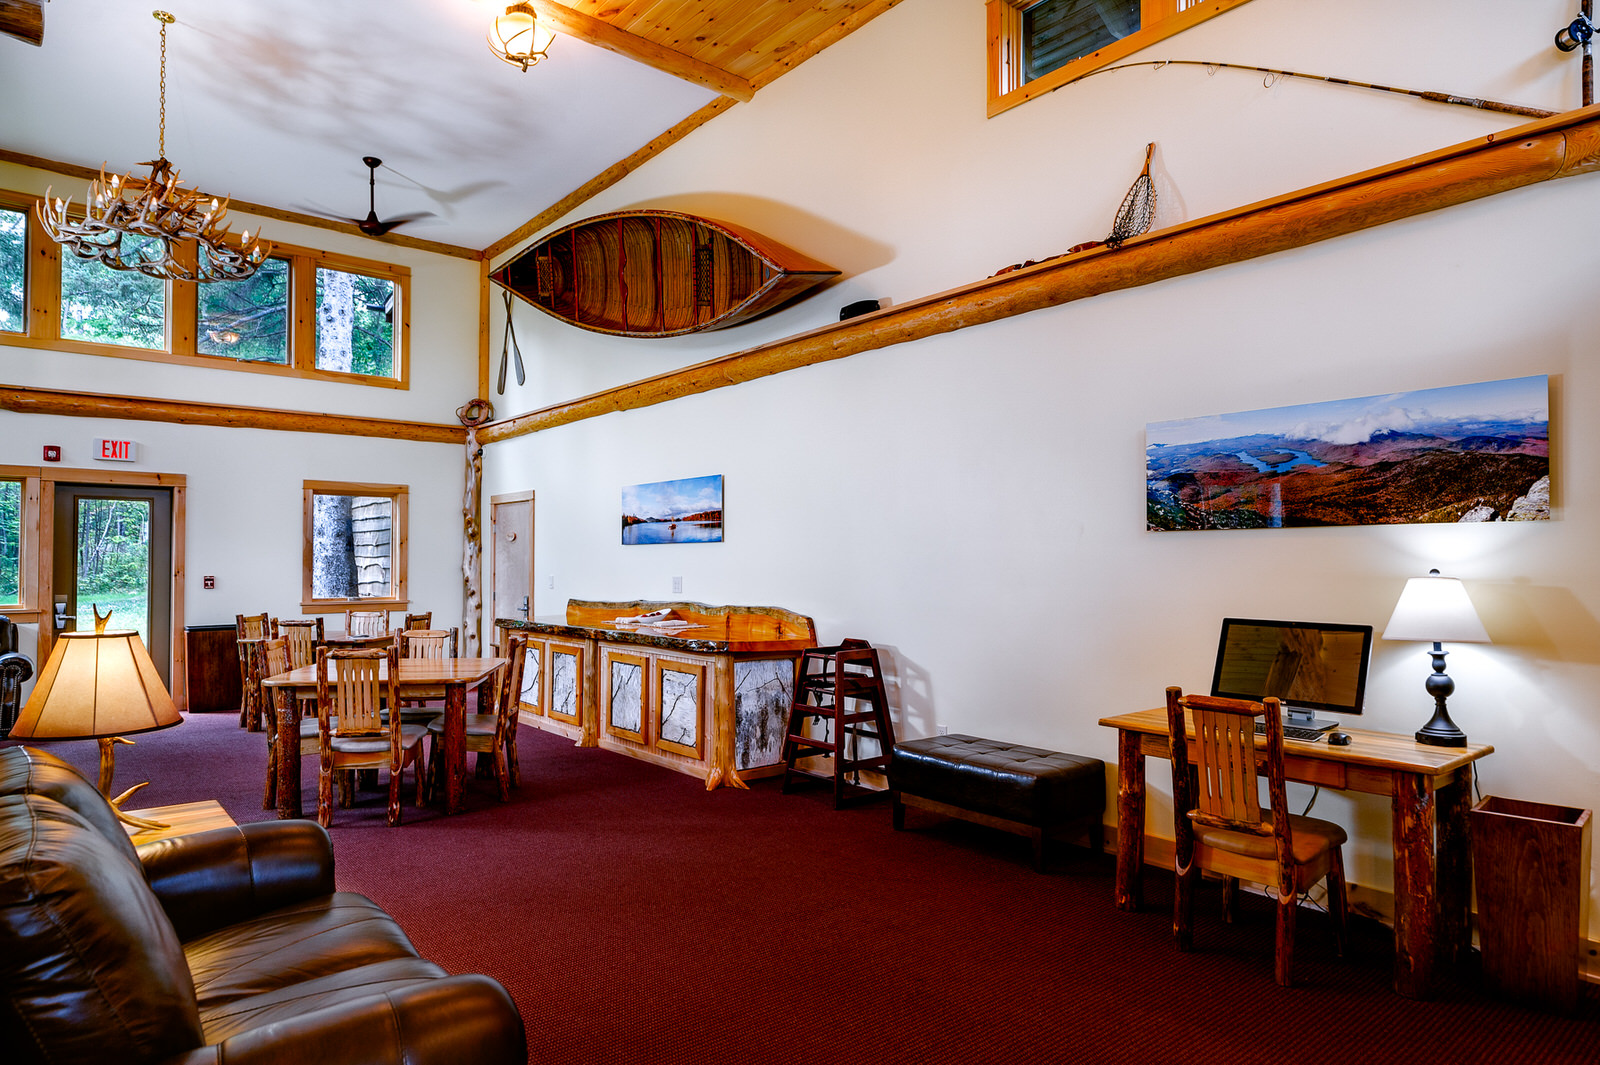 Adk-Spruce-Lodge-2048px-48.jpg